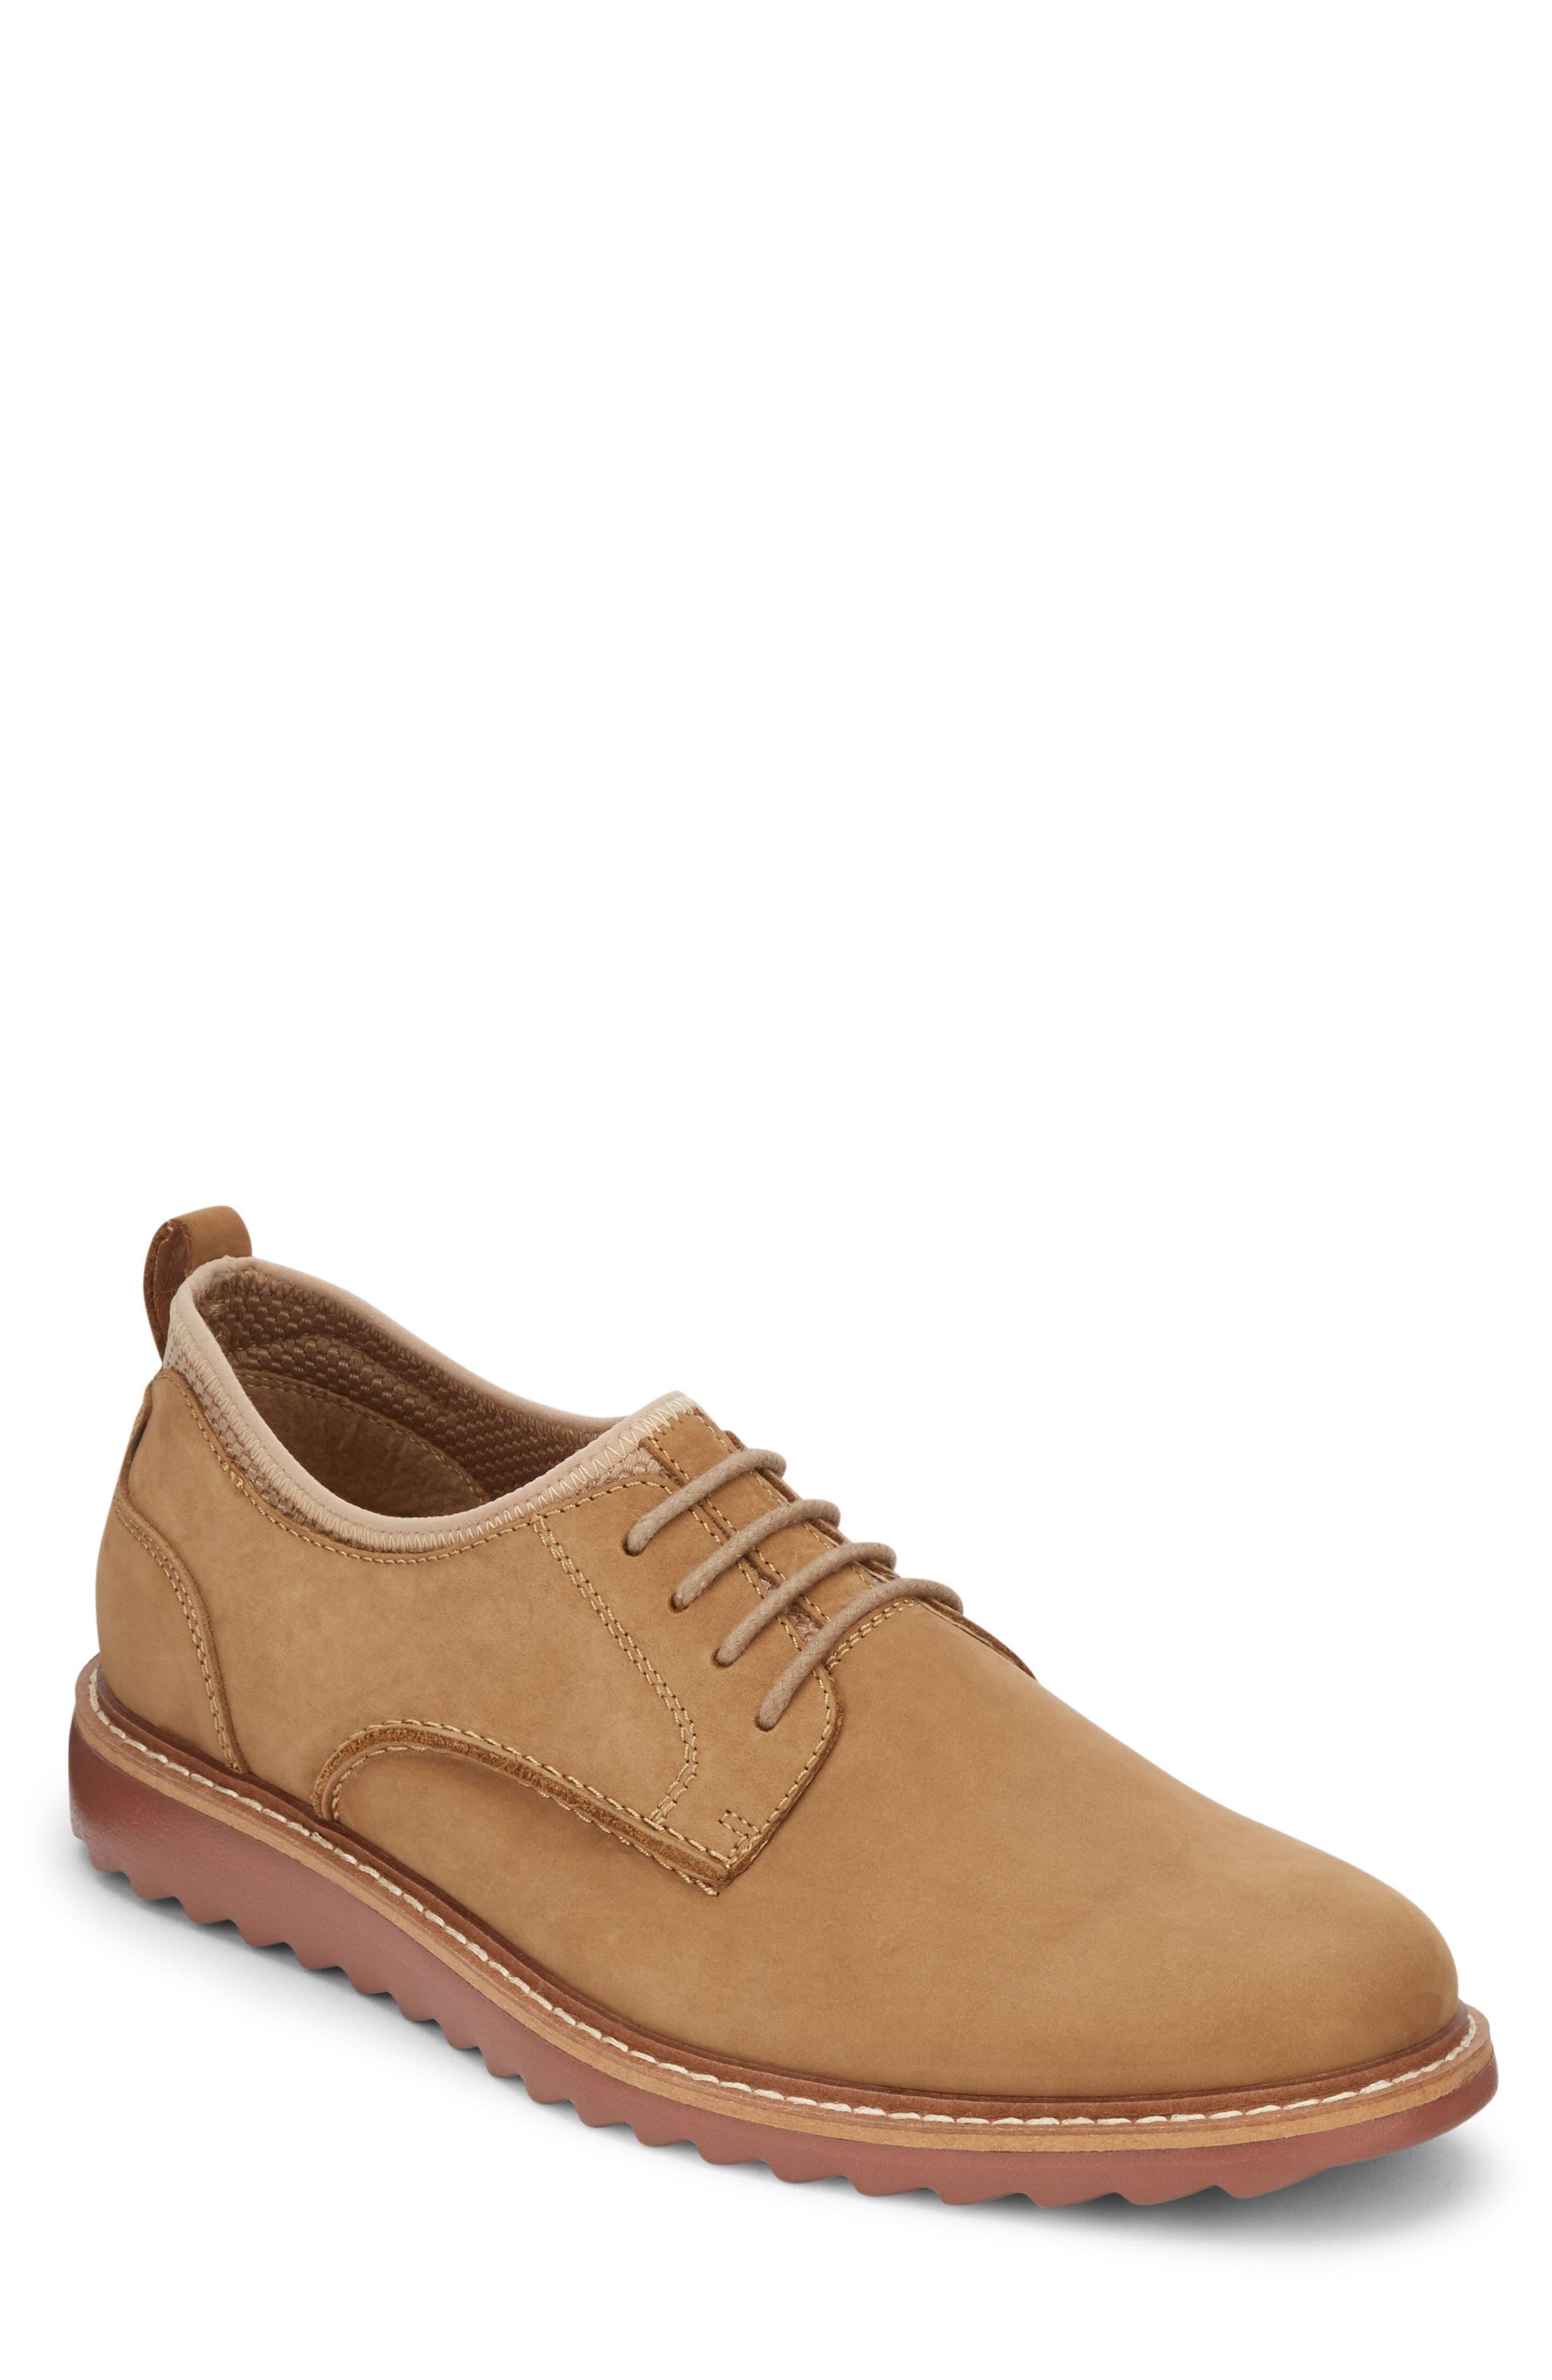 G.H. BASS & CO. Men'S Buck 2.0 Plain-Toe Oxfords Men'S Shoes in Dirty Buck